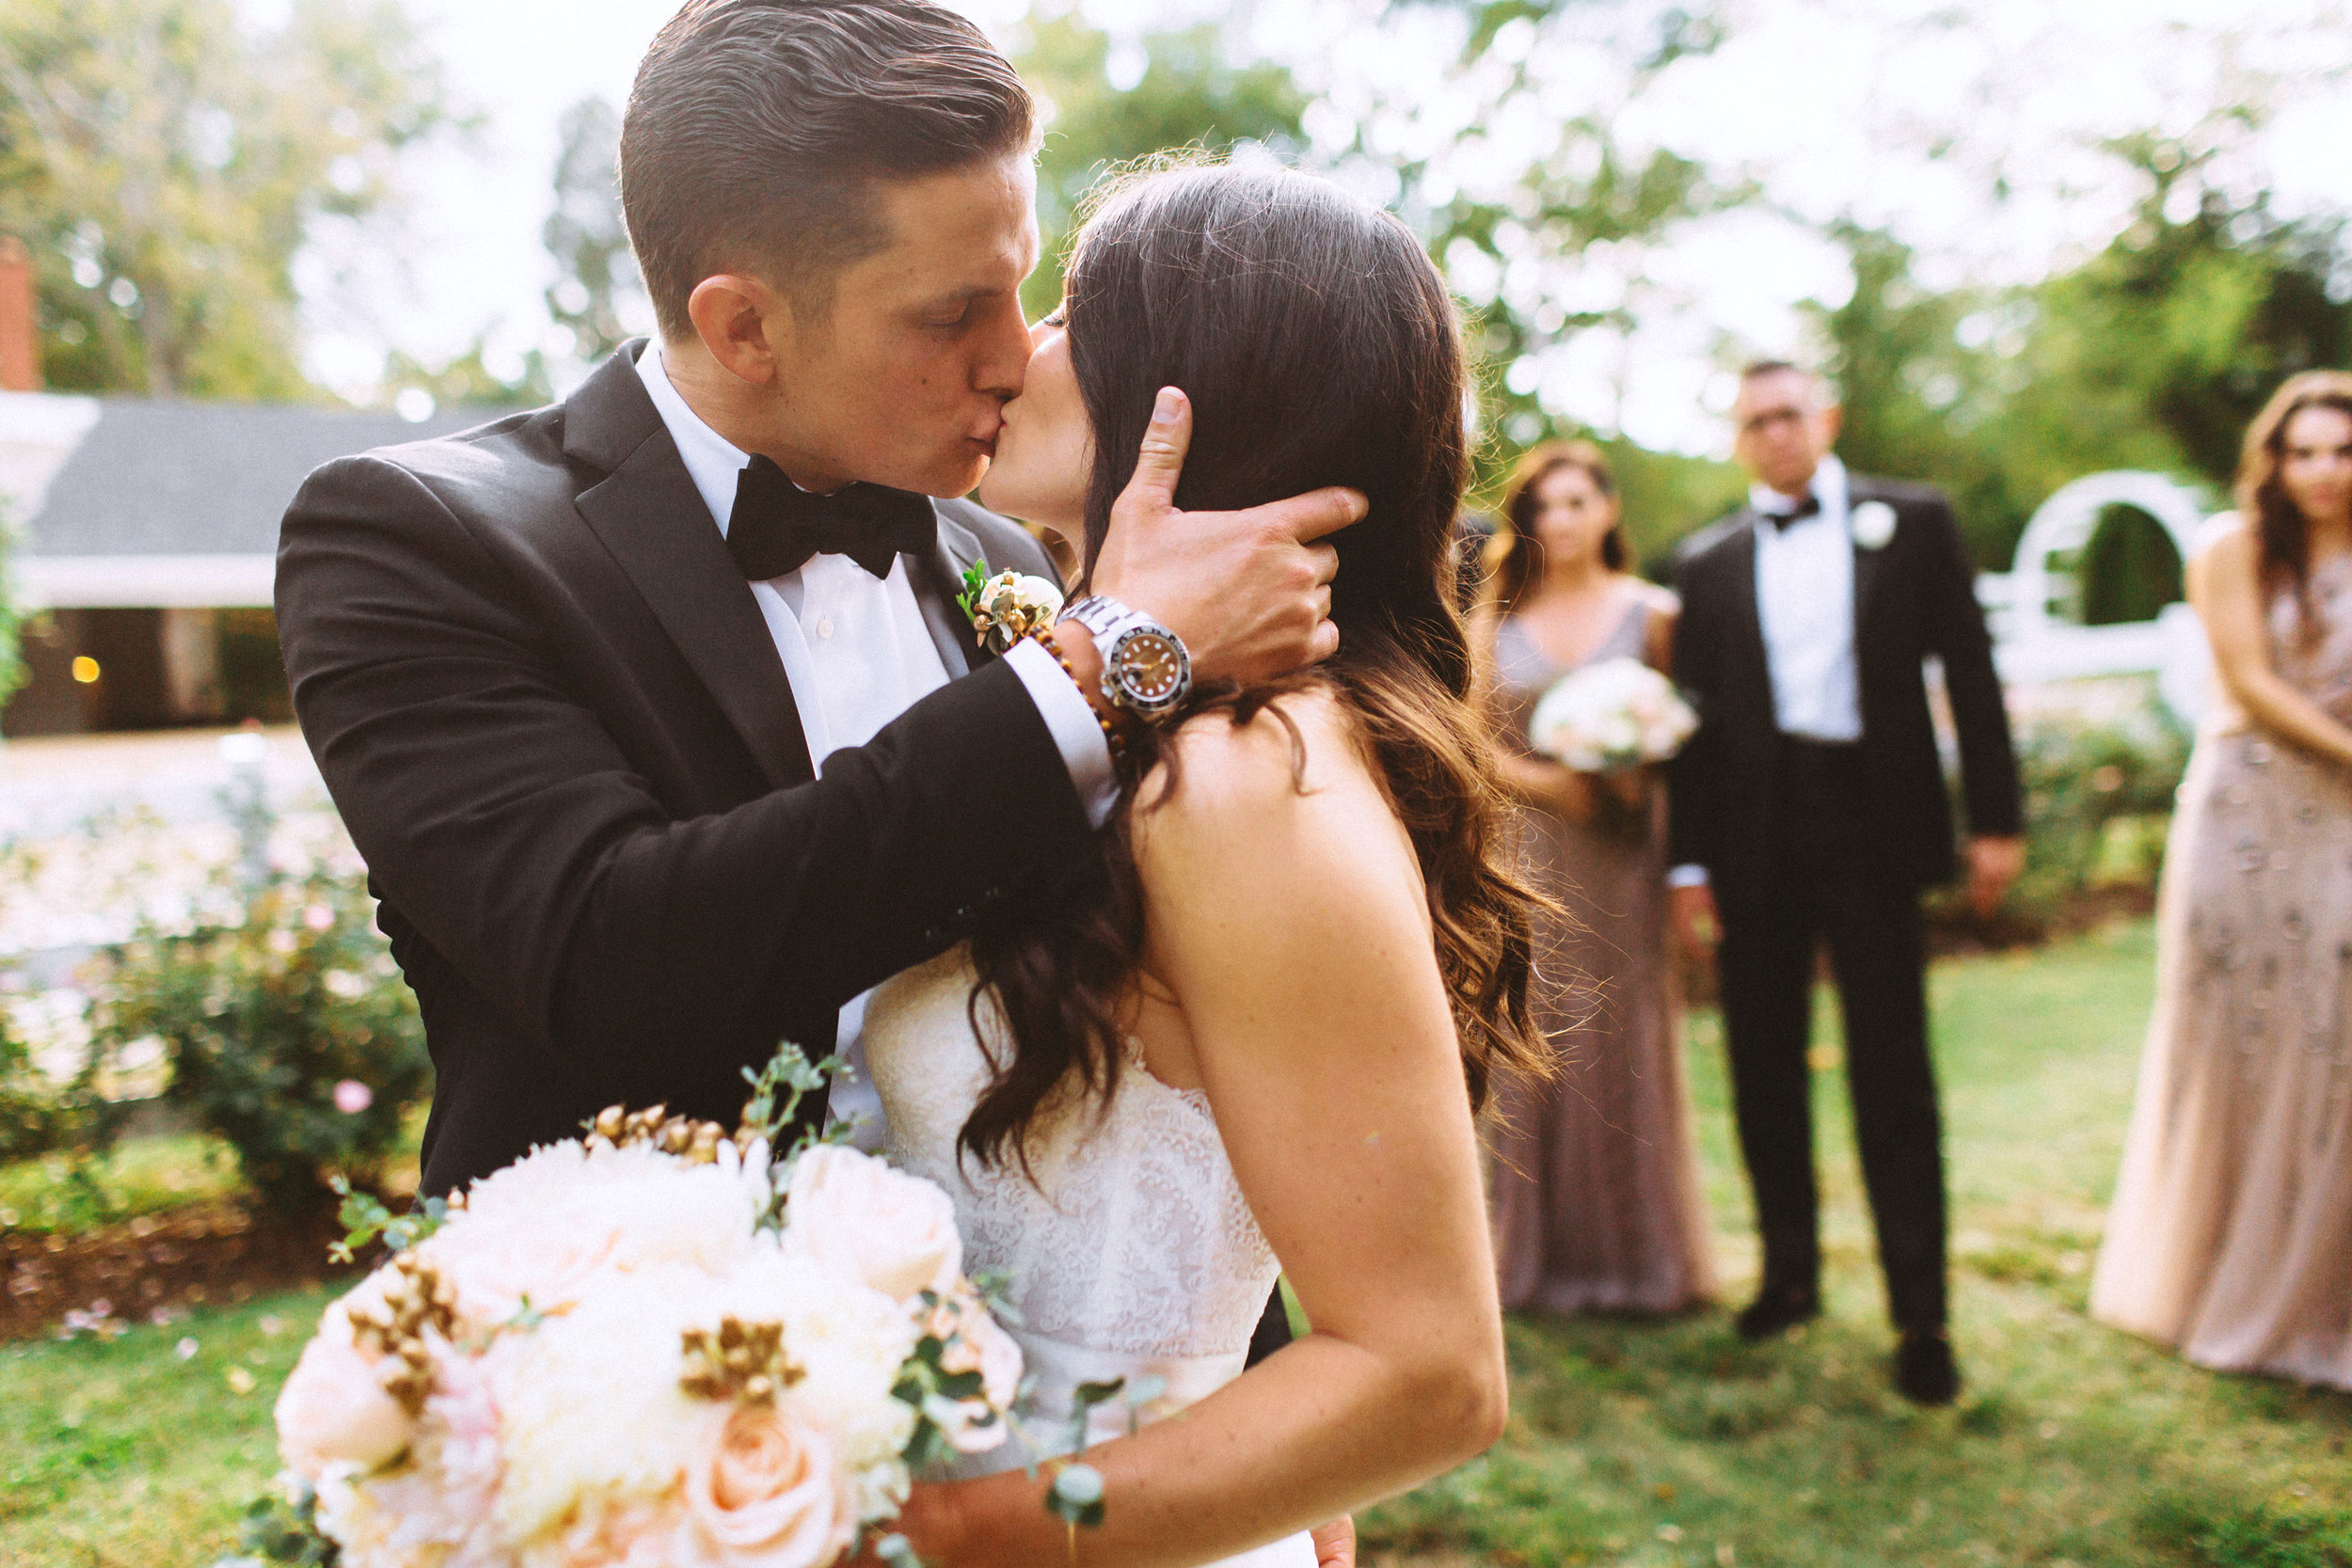 Me & Mr. Jones Wedding, Rustic Glam, Black Tie Wedding, Watters Carina Corset, Watters Amina Skirt, Blush Flowers, Gold Wedding, Rolex GMT Master II